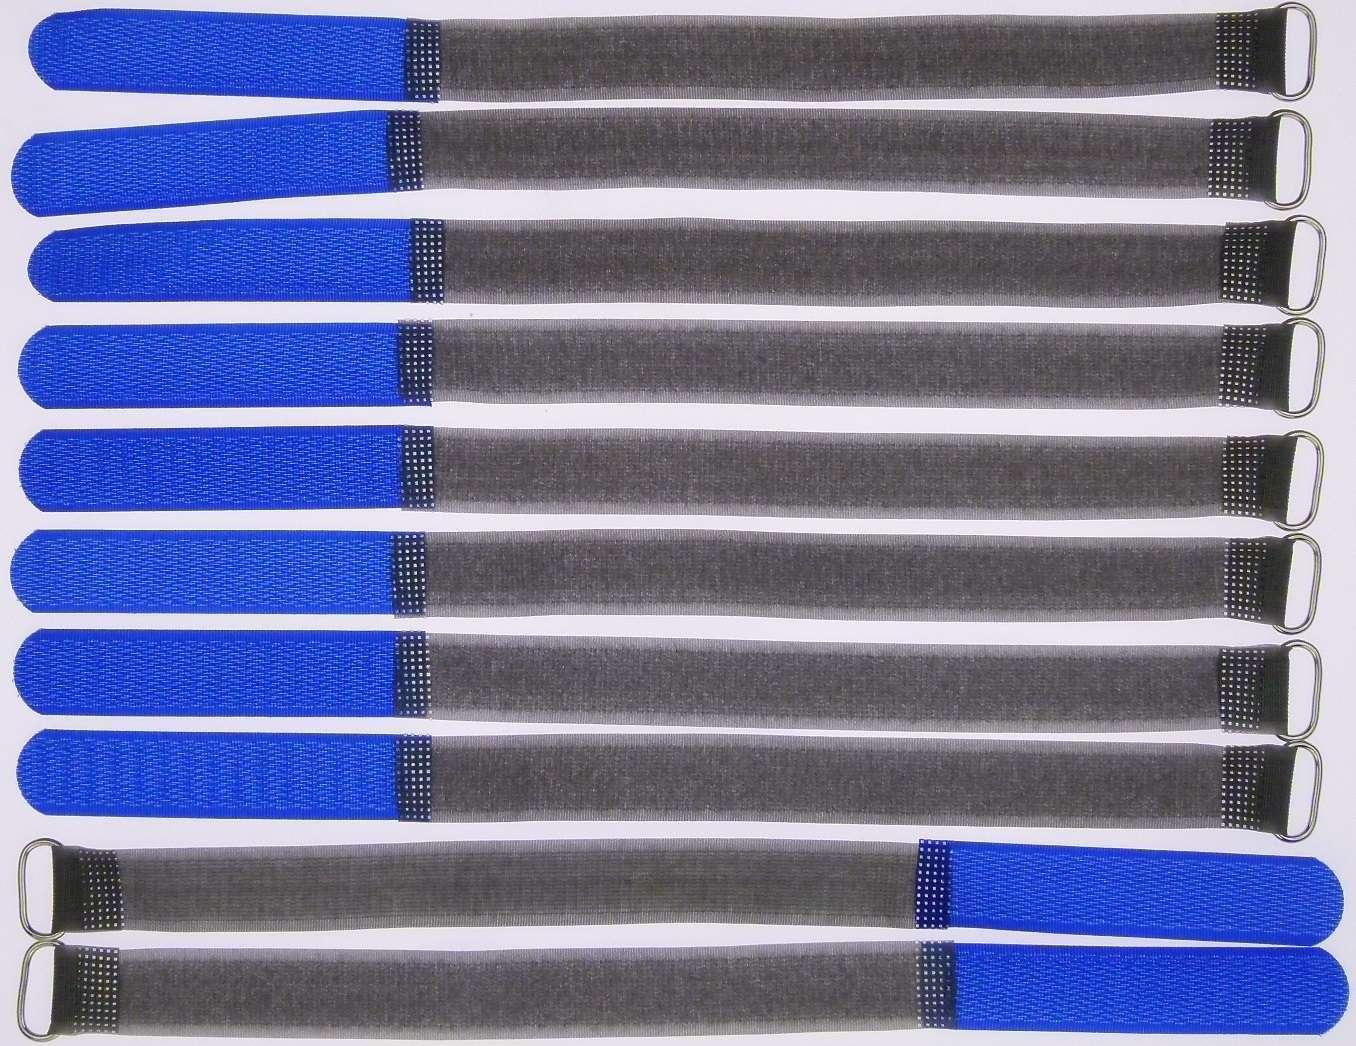 10 Kabelbinder Kabelklett 30 cm x 20 mm hell blau Klettband Klettkabelbinder Öse